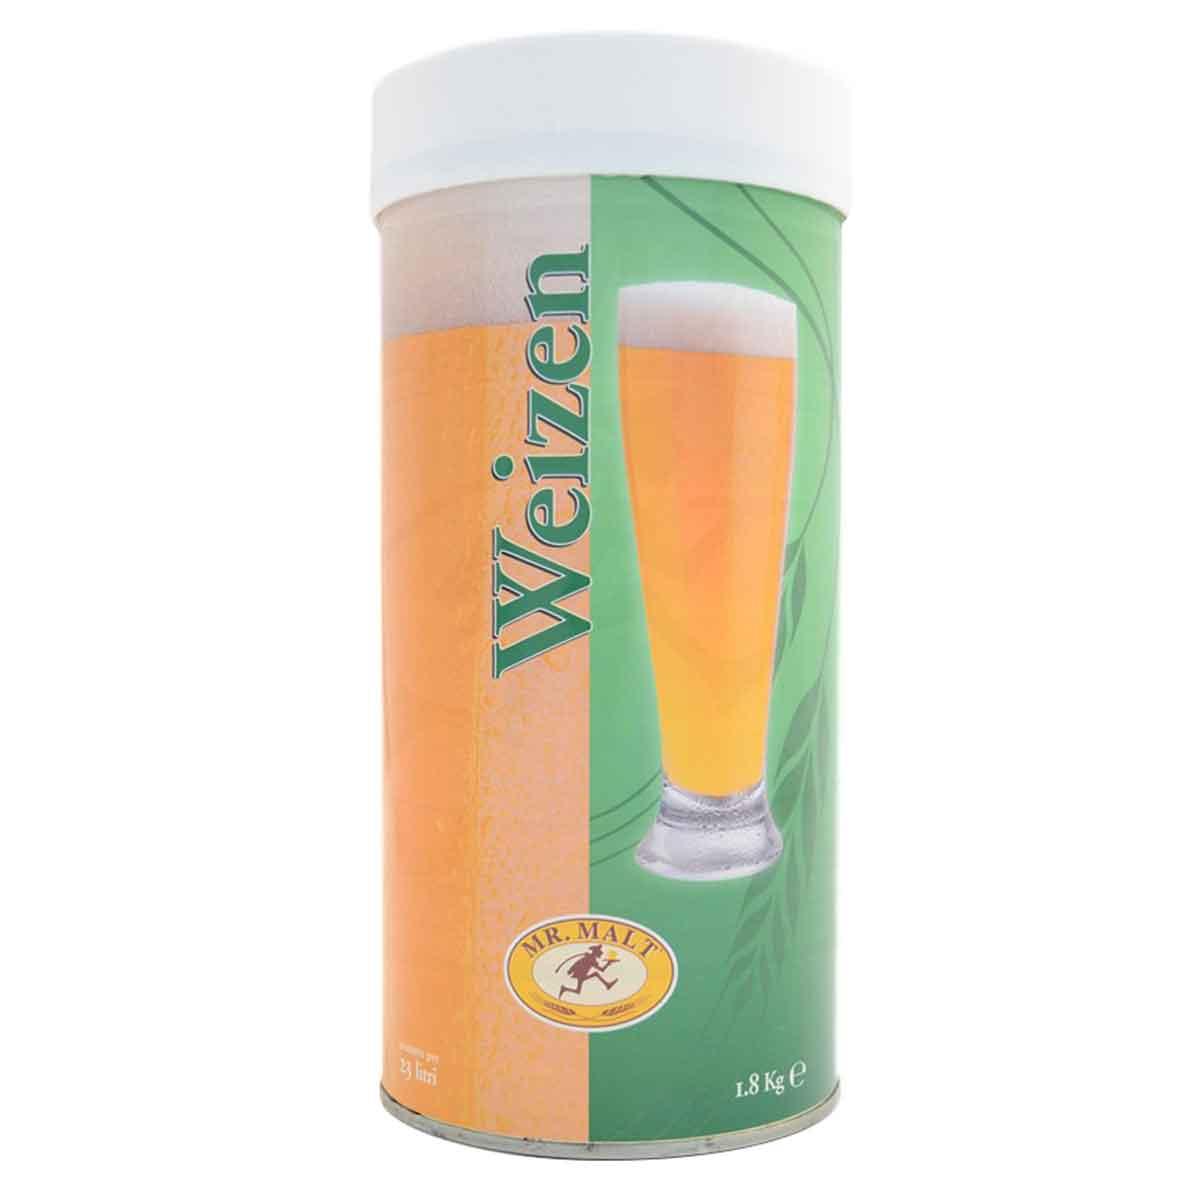 Malto per birra Coopers Mr. Malt Premium Weizen